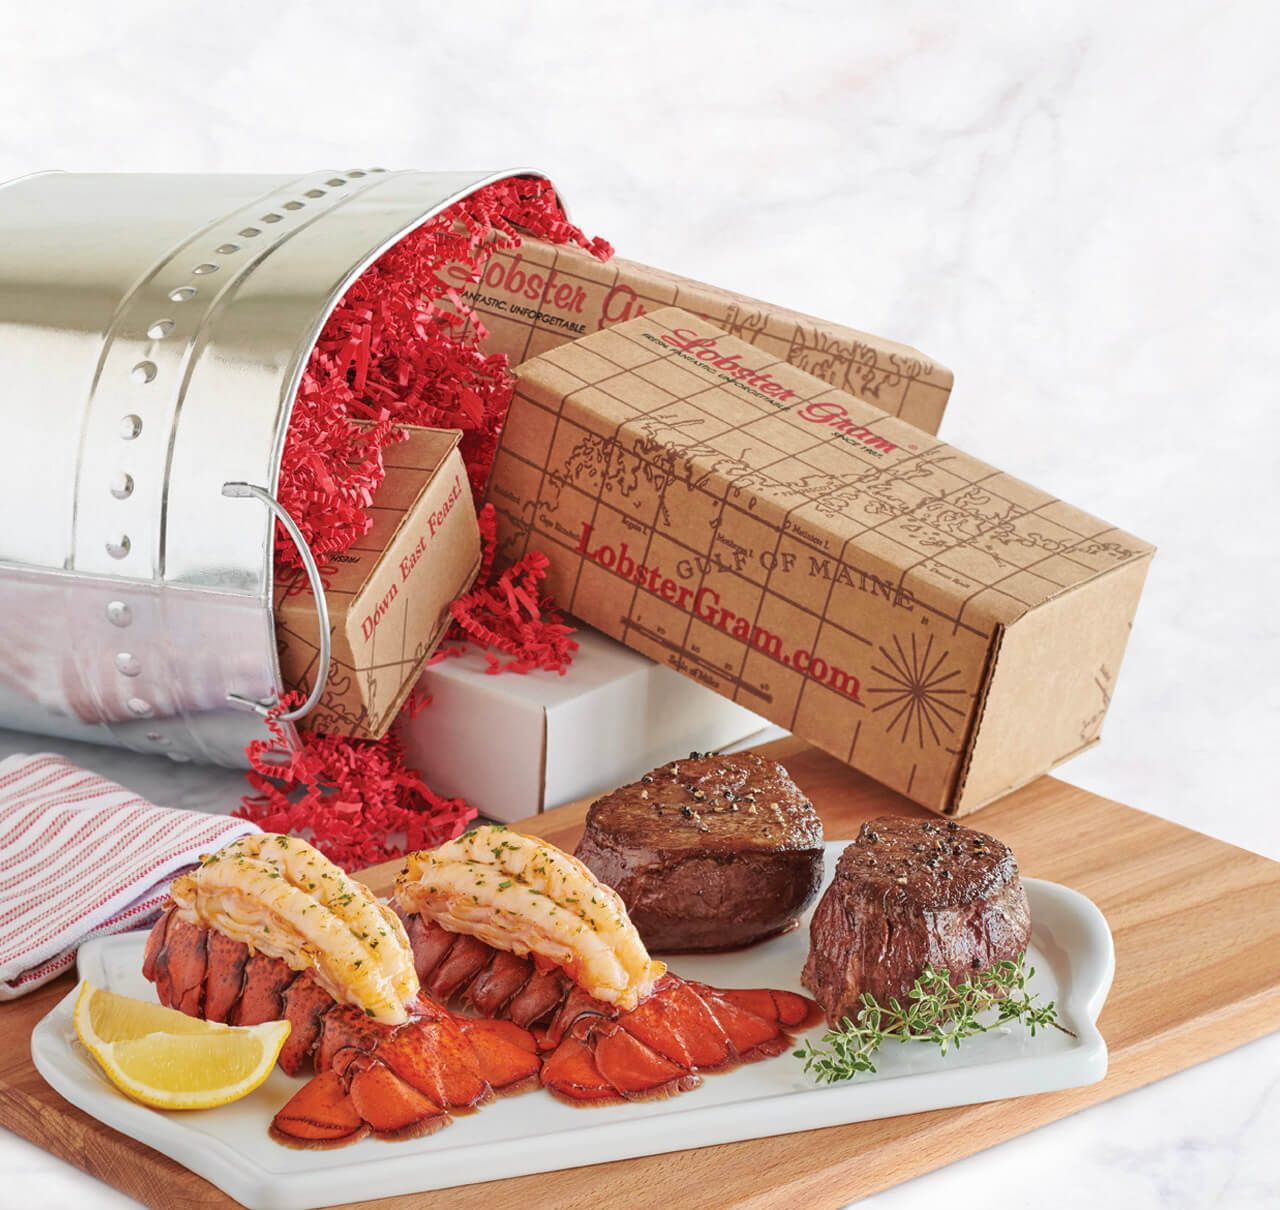 Maine Live Lobster Steak Seafood Dinners Delivered At Lobstergram Com Steak And Seafood Seafood Dinner Live Lobster